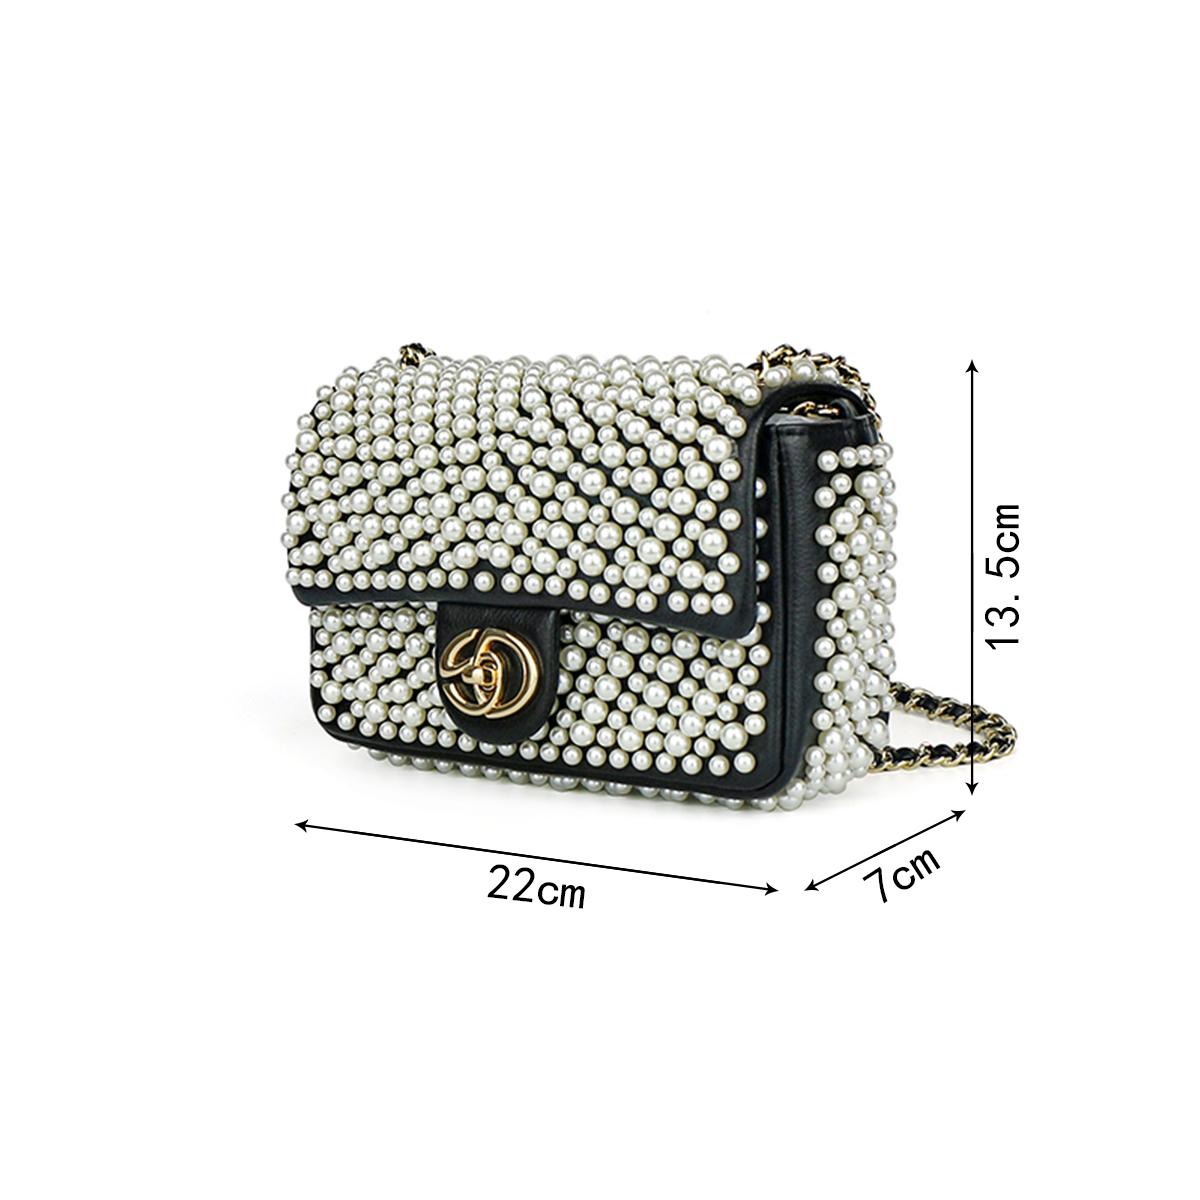 1A SD6272 萨迪珍珠链条锁扣包 2149